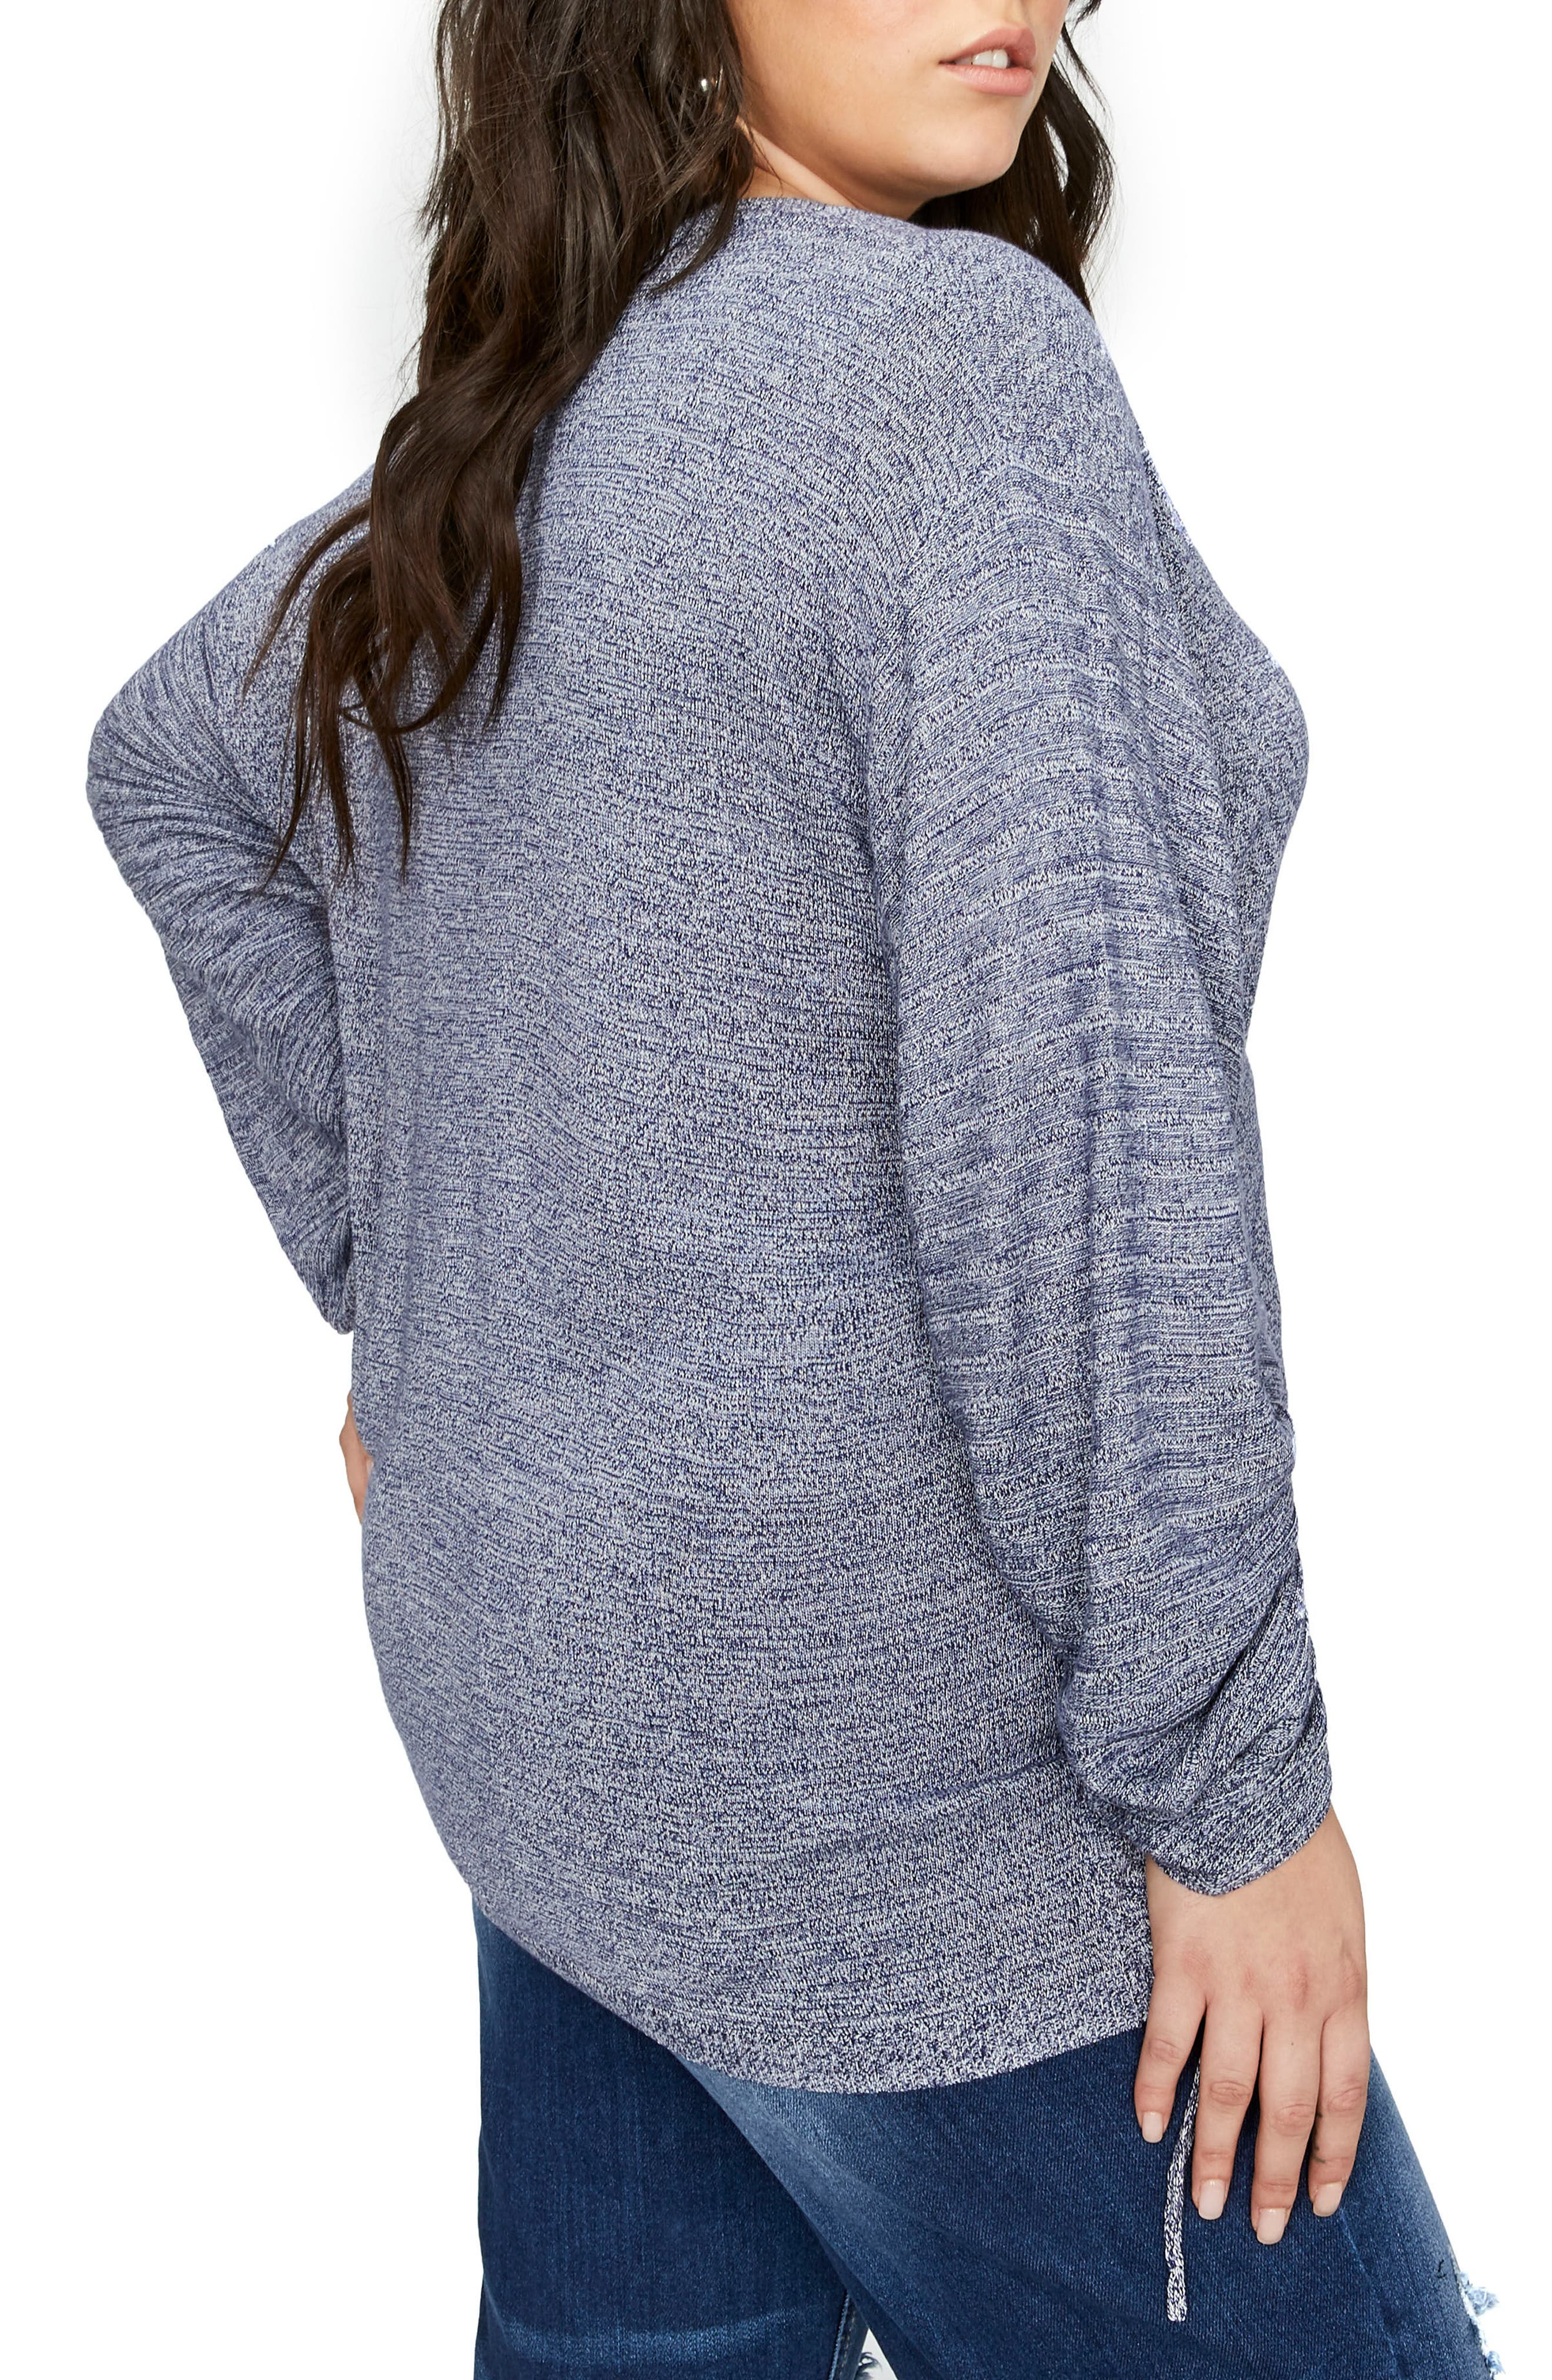 Drawcord Sleeve Sweater,                             Alternate thumbnail 2, color,                             Egret Blue Print